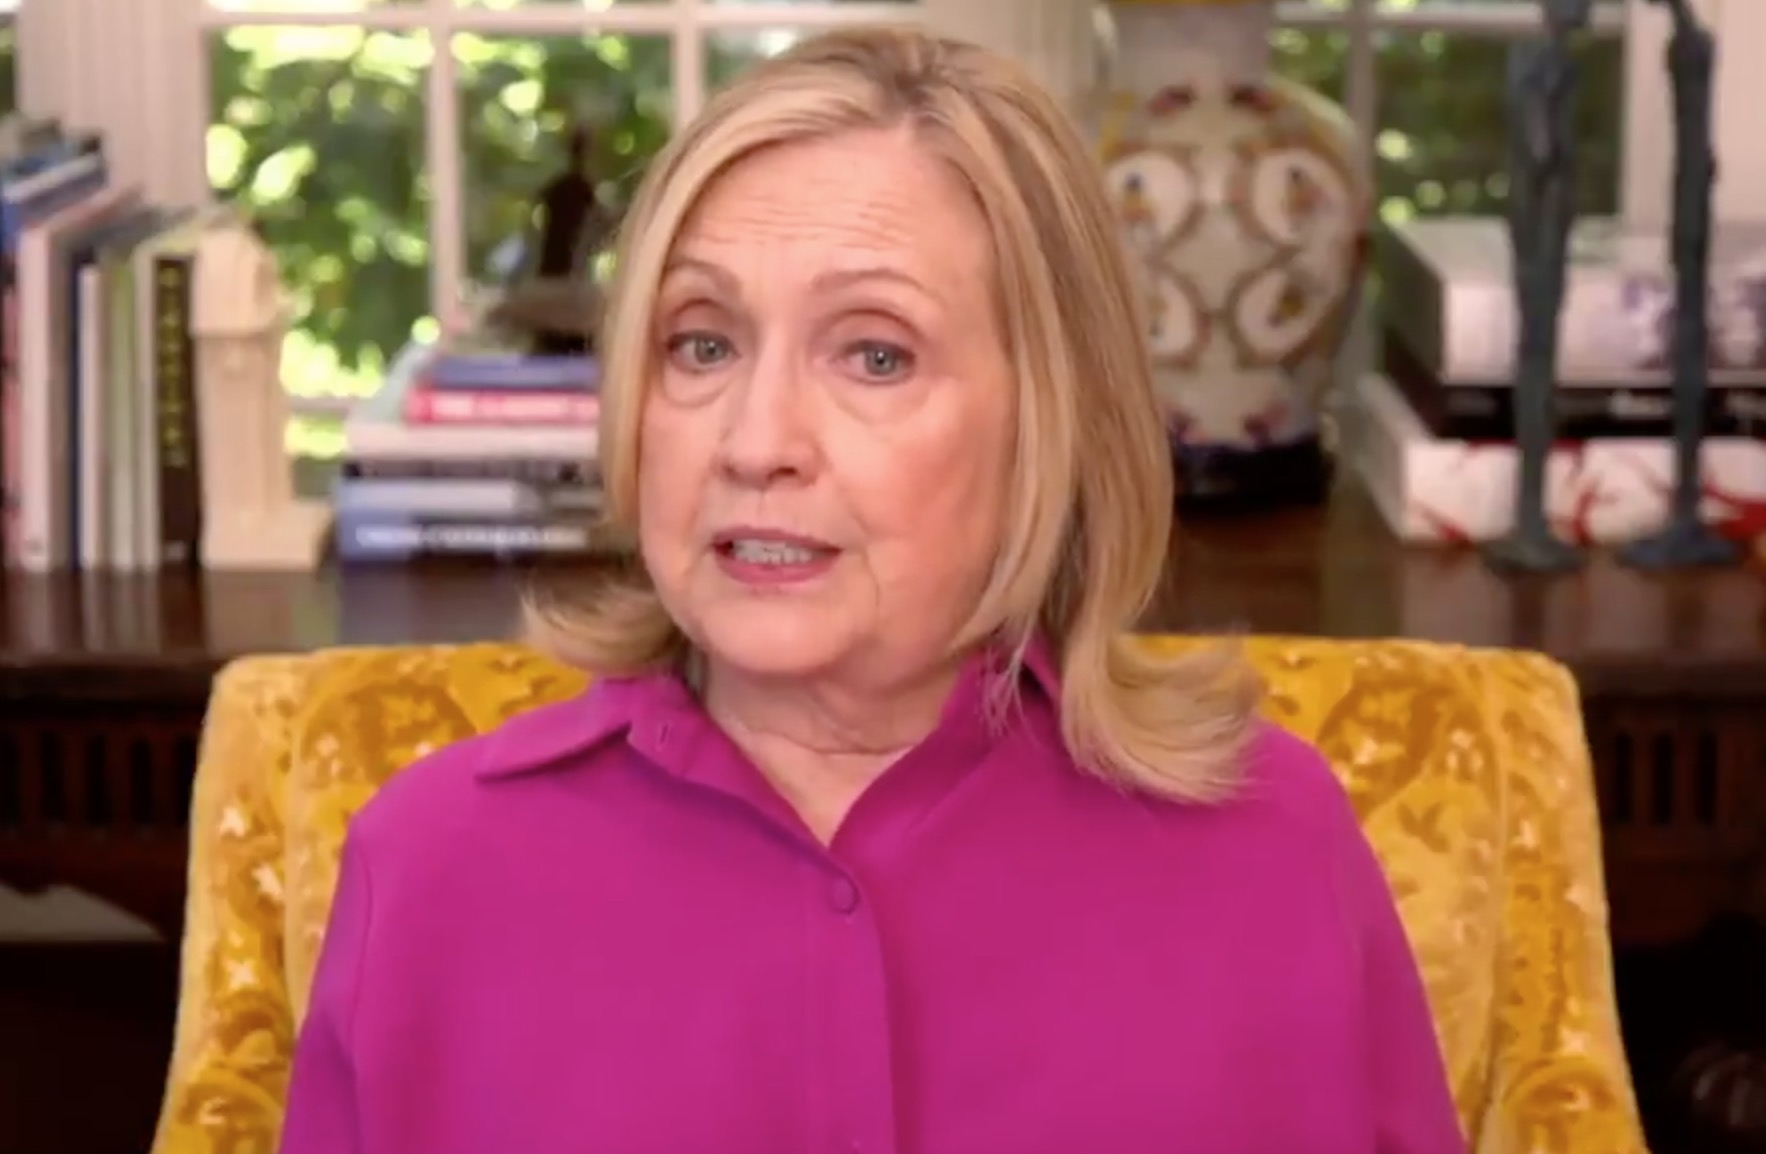 Clinton: Biden 'Should Not Concede Under Any Circumstances'